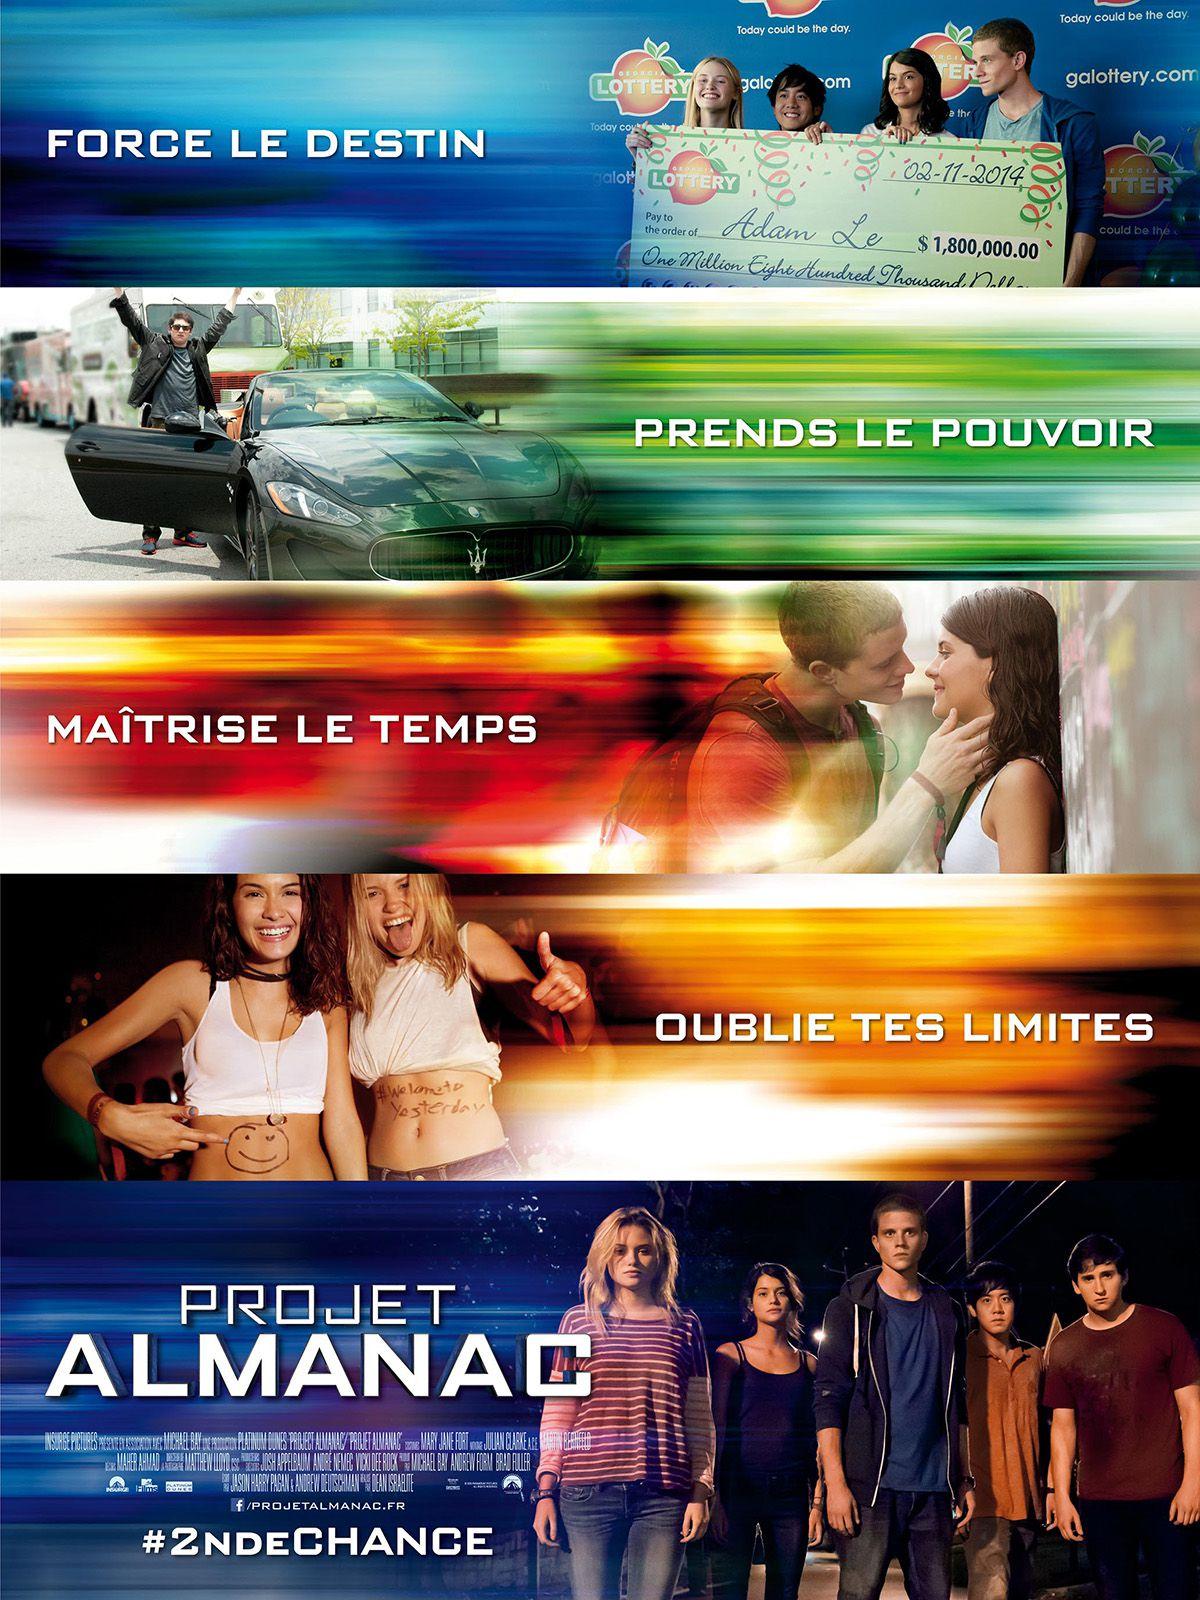 Projet Almanac - Film (2014)